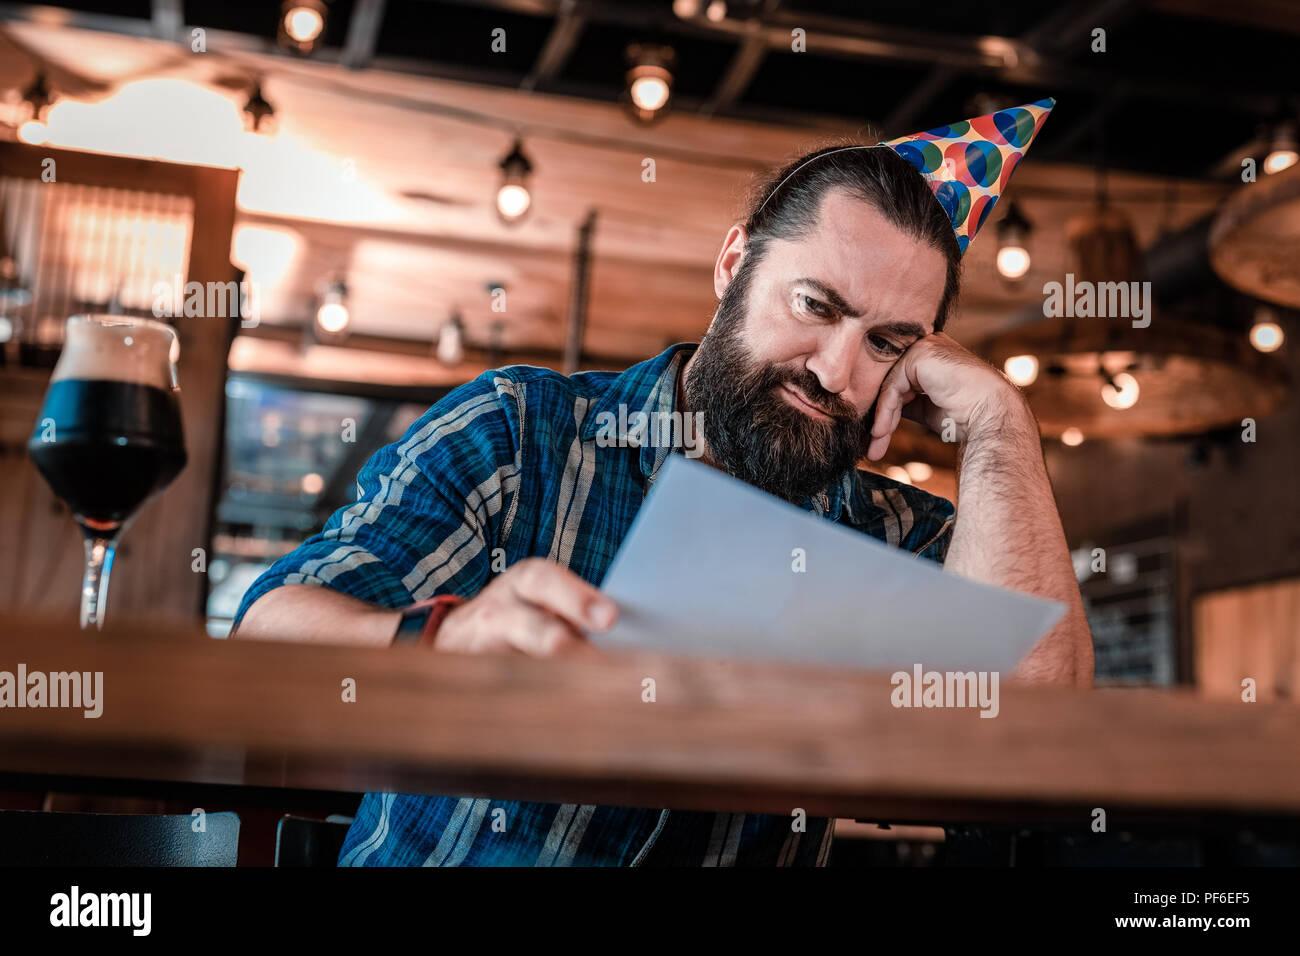 Dark-haired man overcoming midlife crisis sitting in bar - Stock Image